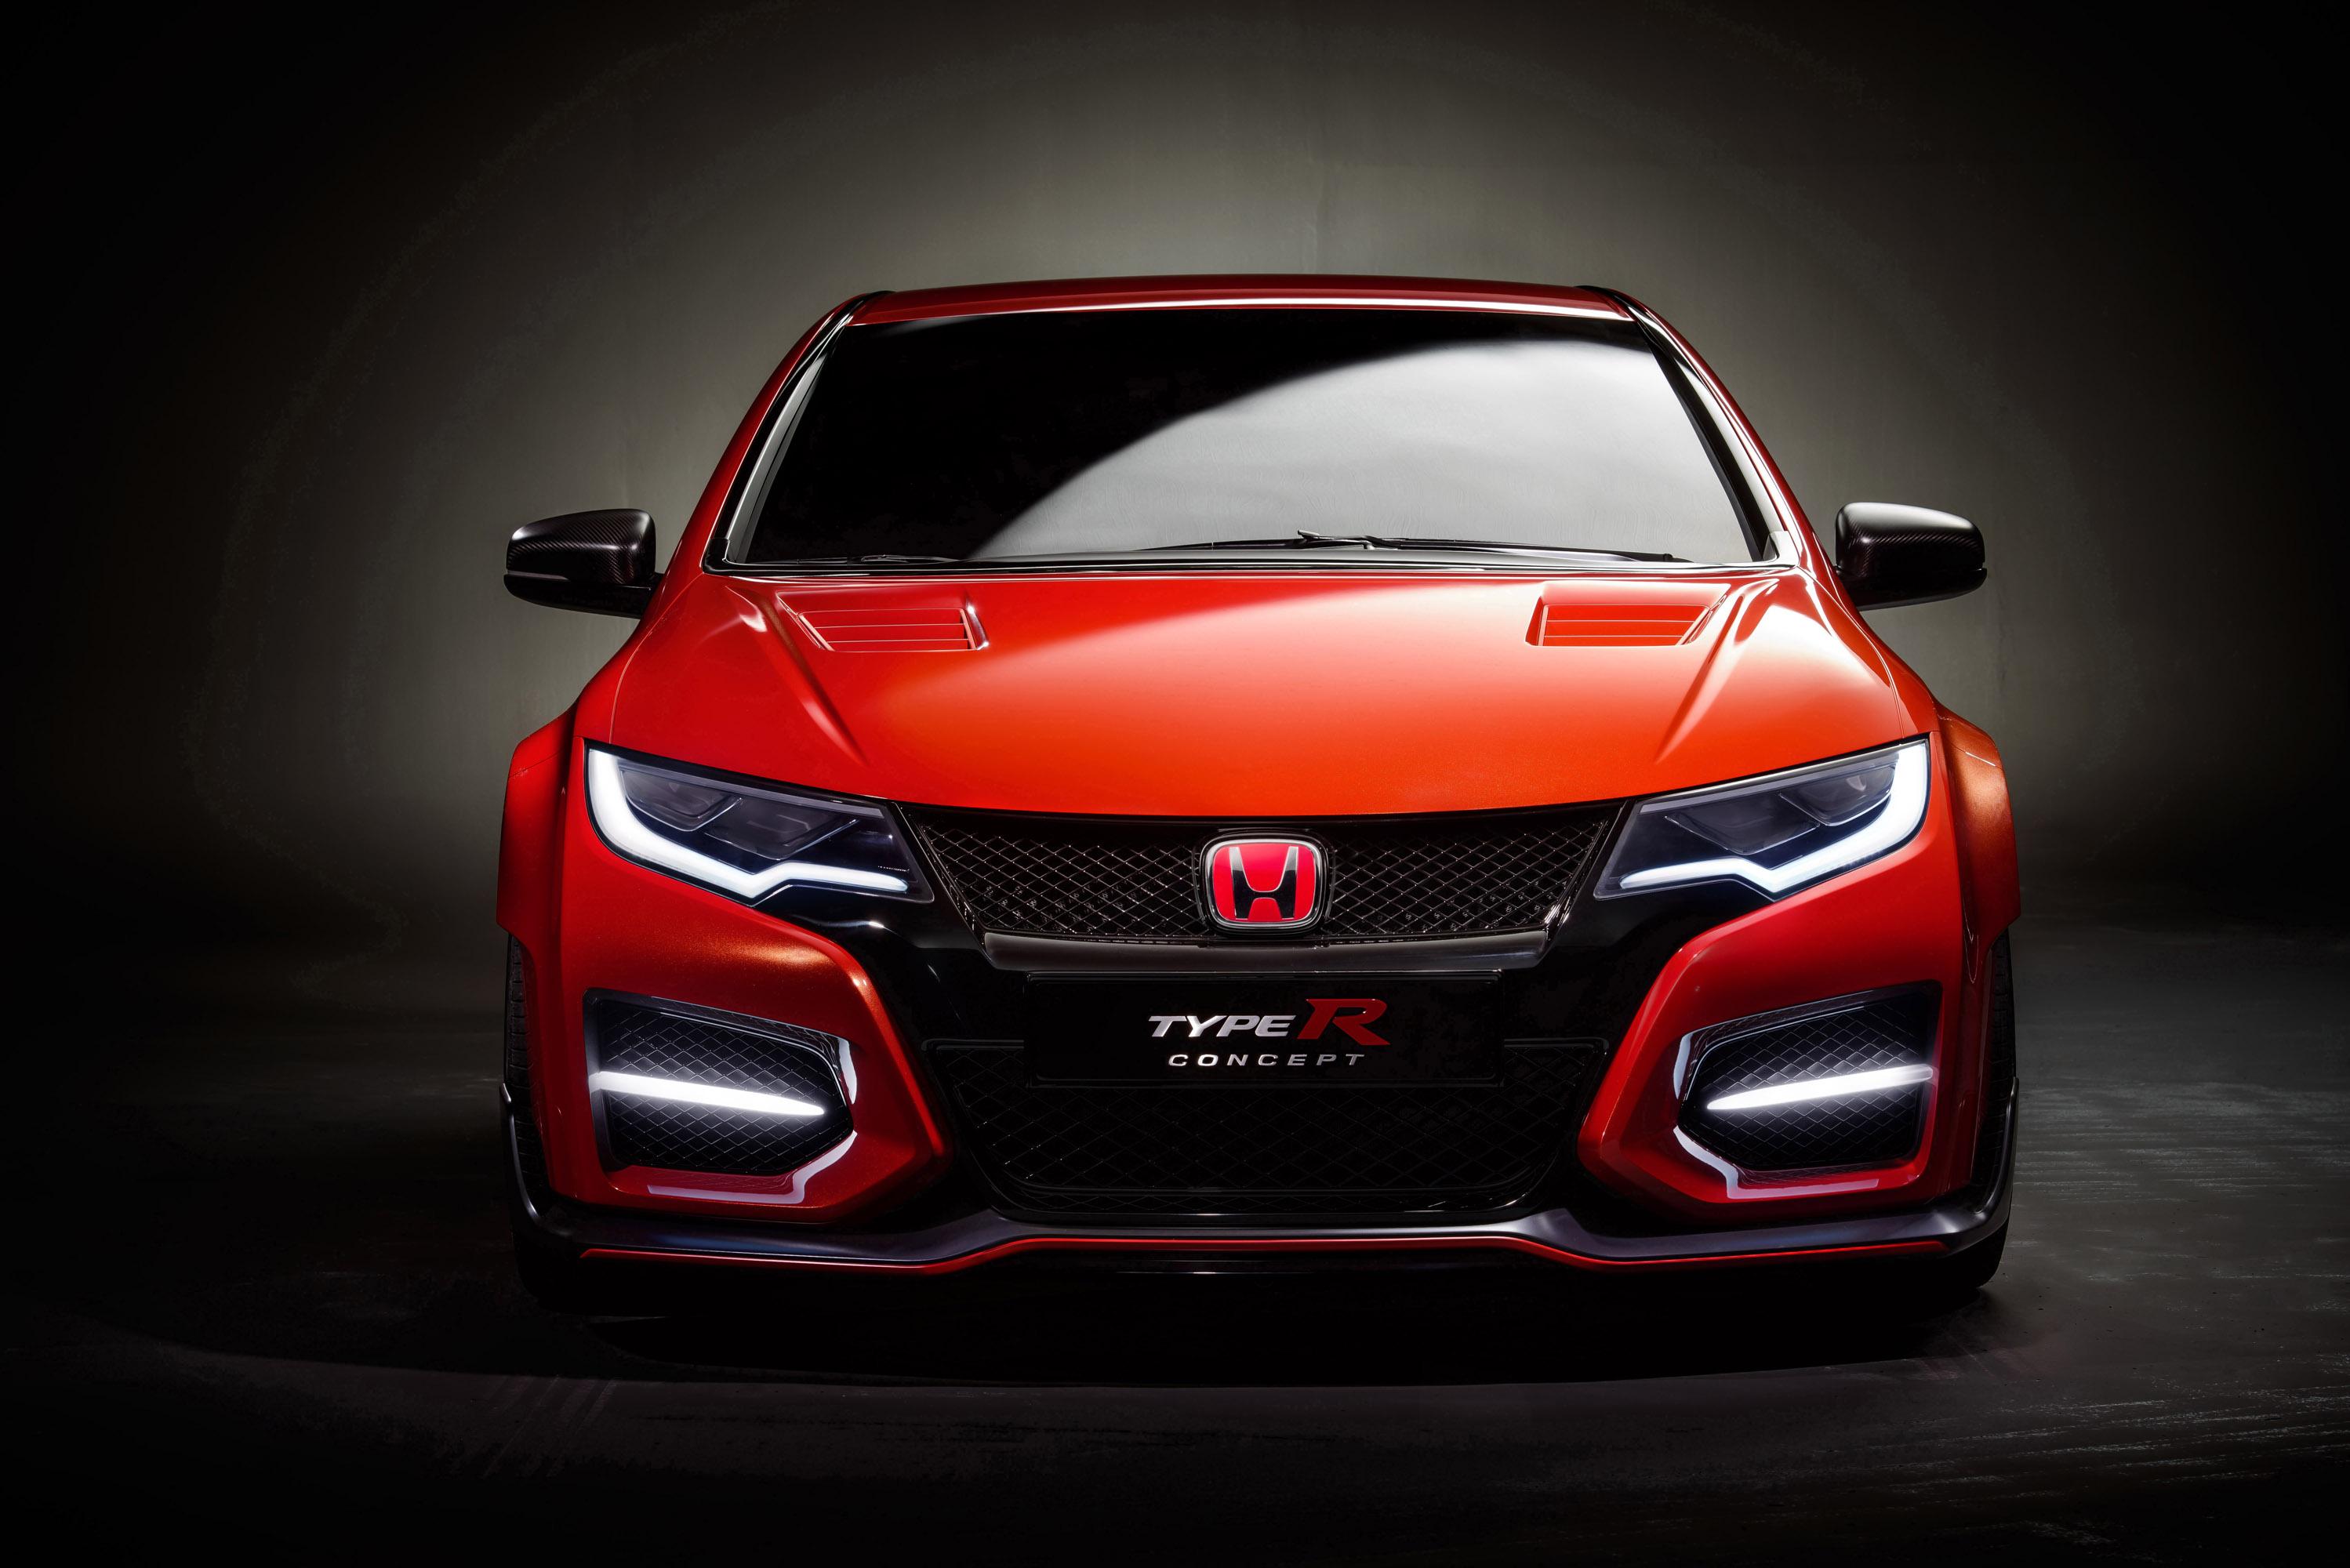 Honda Civic Type R Concept photo #2